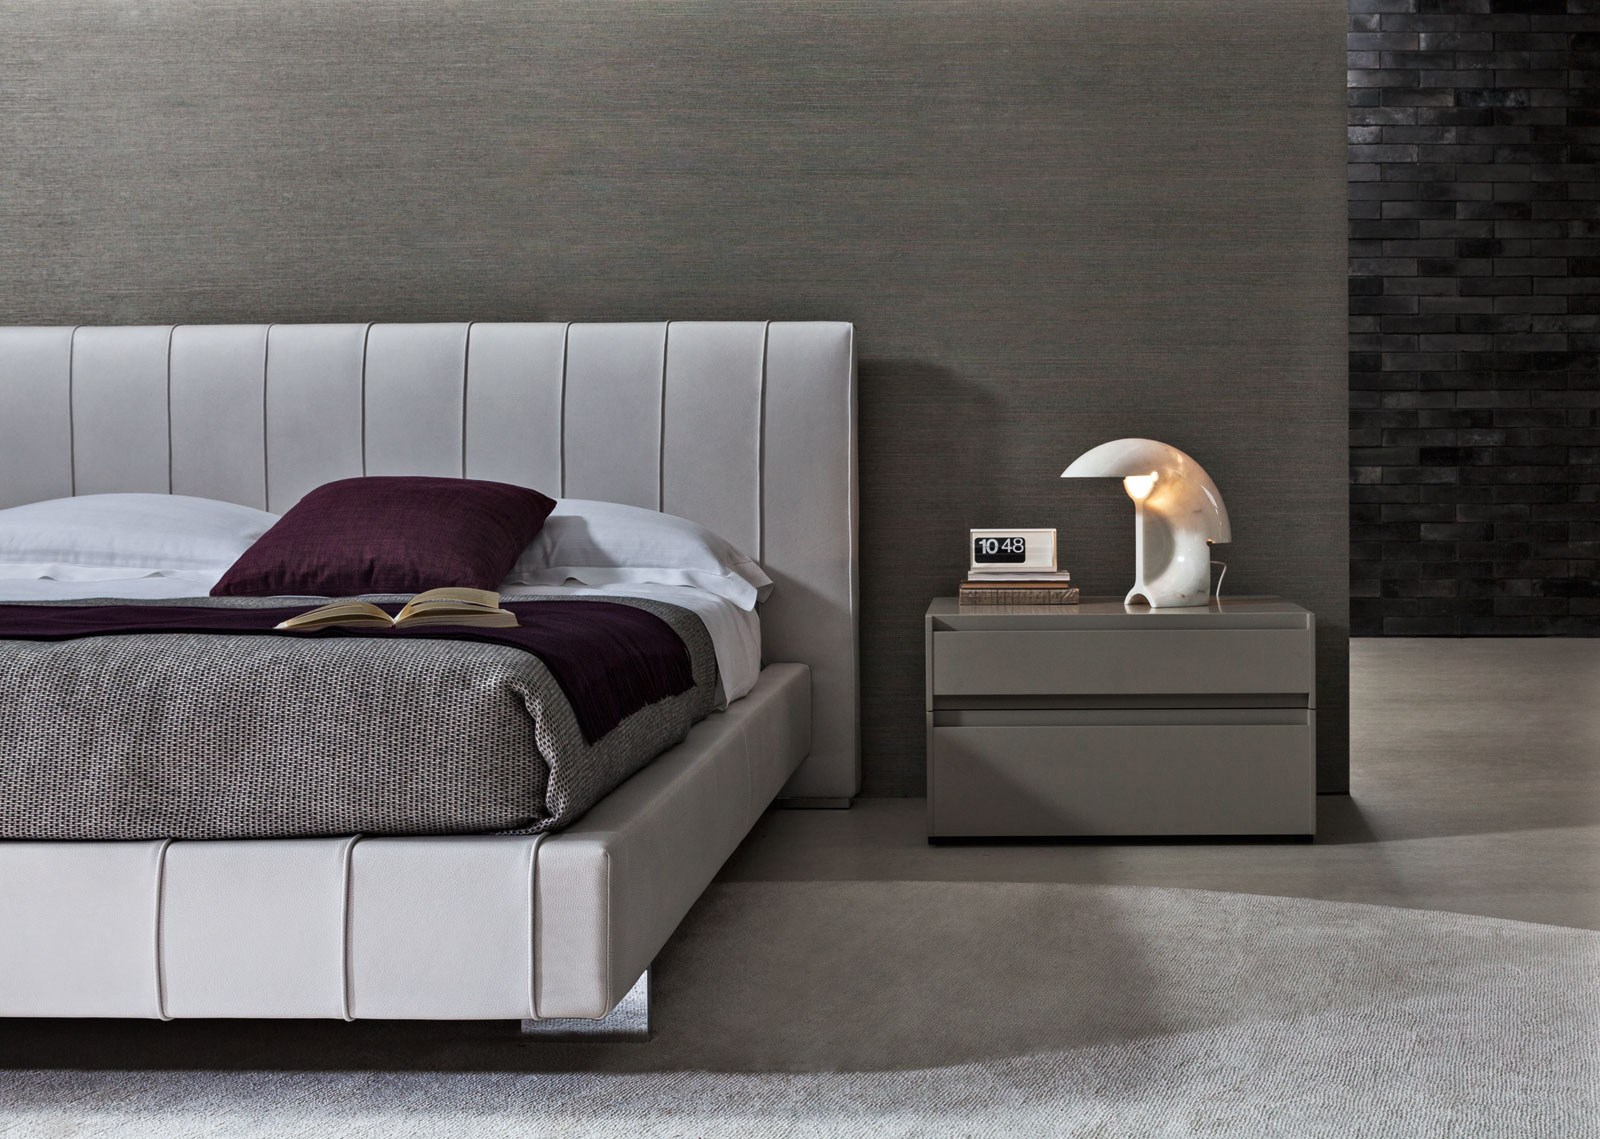 Bedside Table Dresser 808 By Molteni Amp C Design Molteni